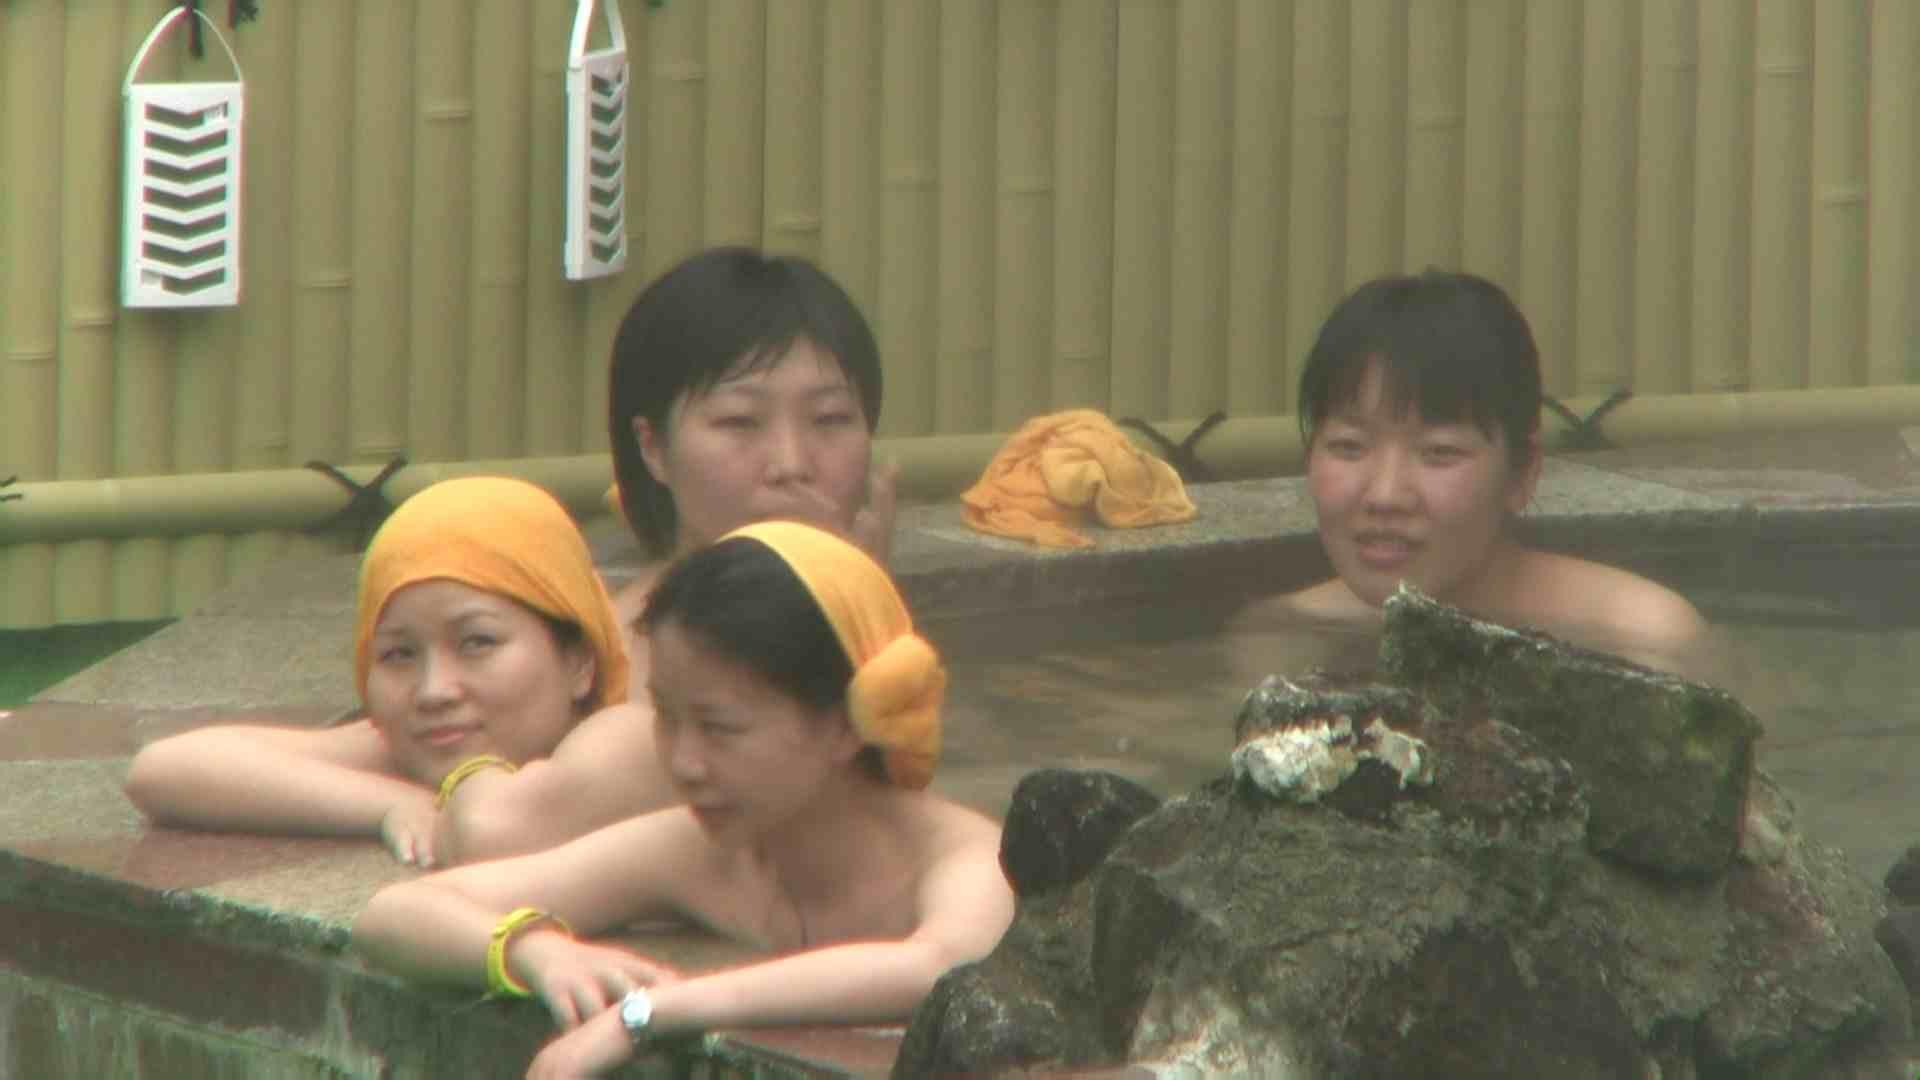 Aquaな露天風呂Vol.73【VIP限定】 盗撮 | HなOL  54pic 16